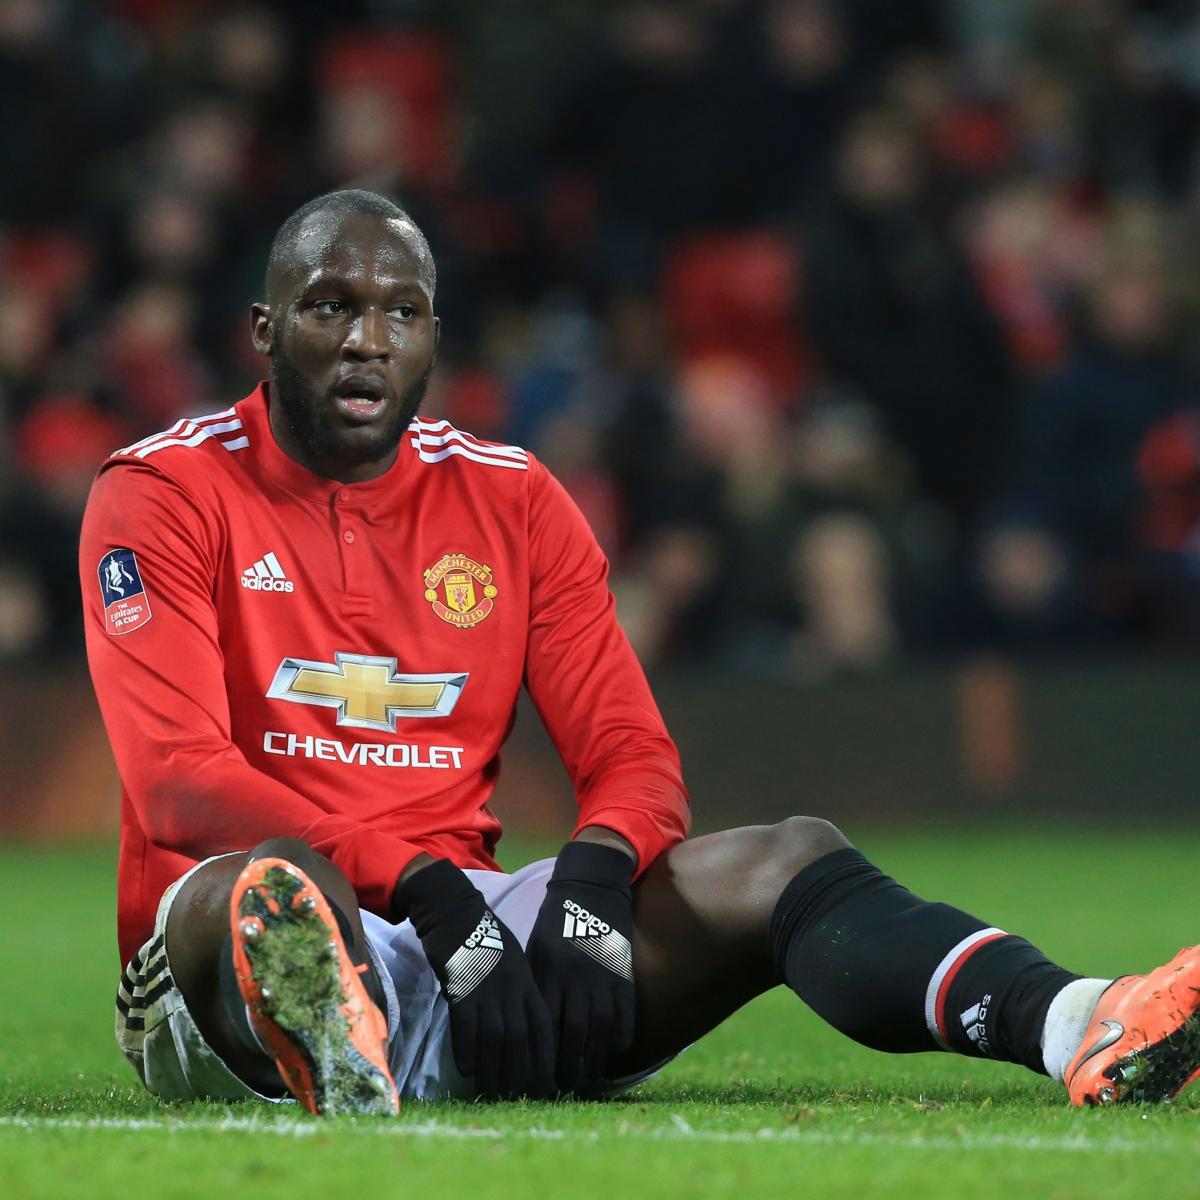 Manchester United vs. Stoke City: Team News, Preview, Live Stream, TV Info